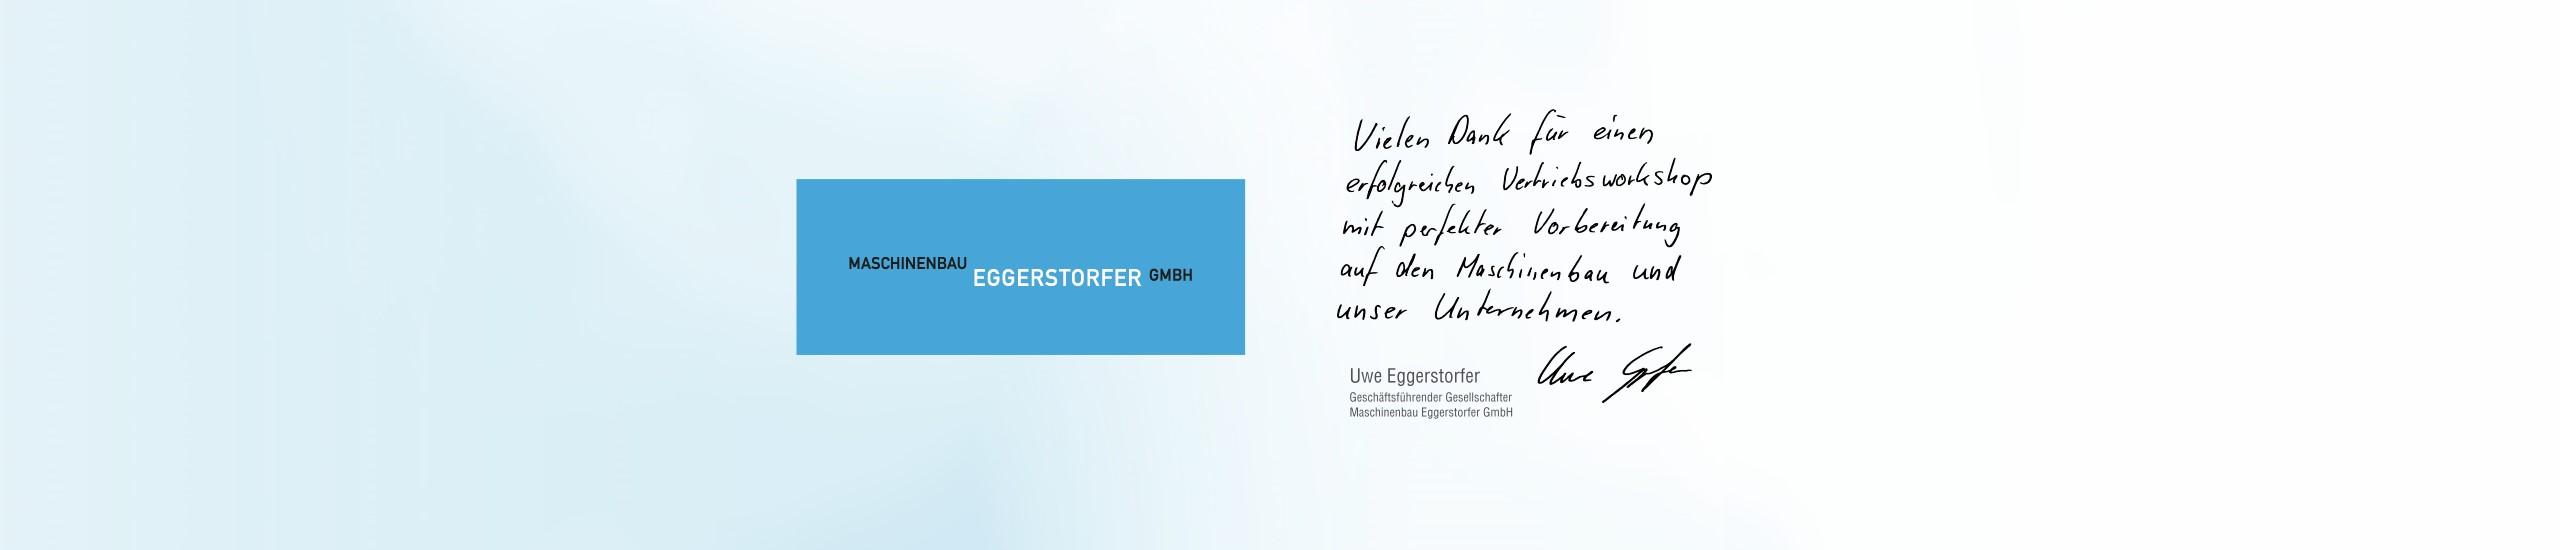 referenz_eggerstorfer_3